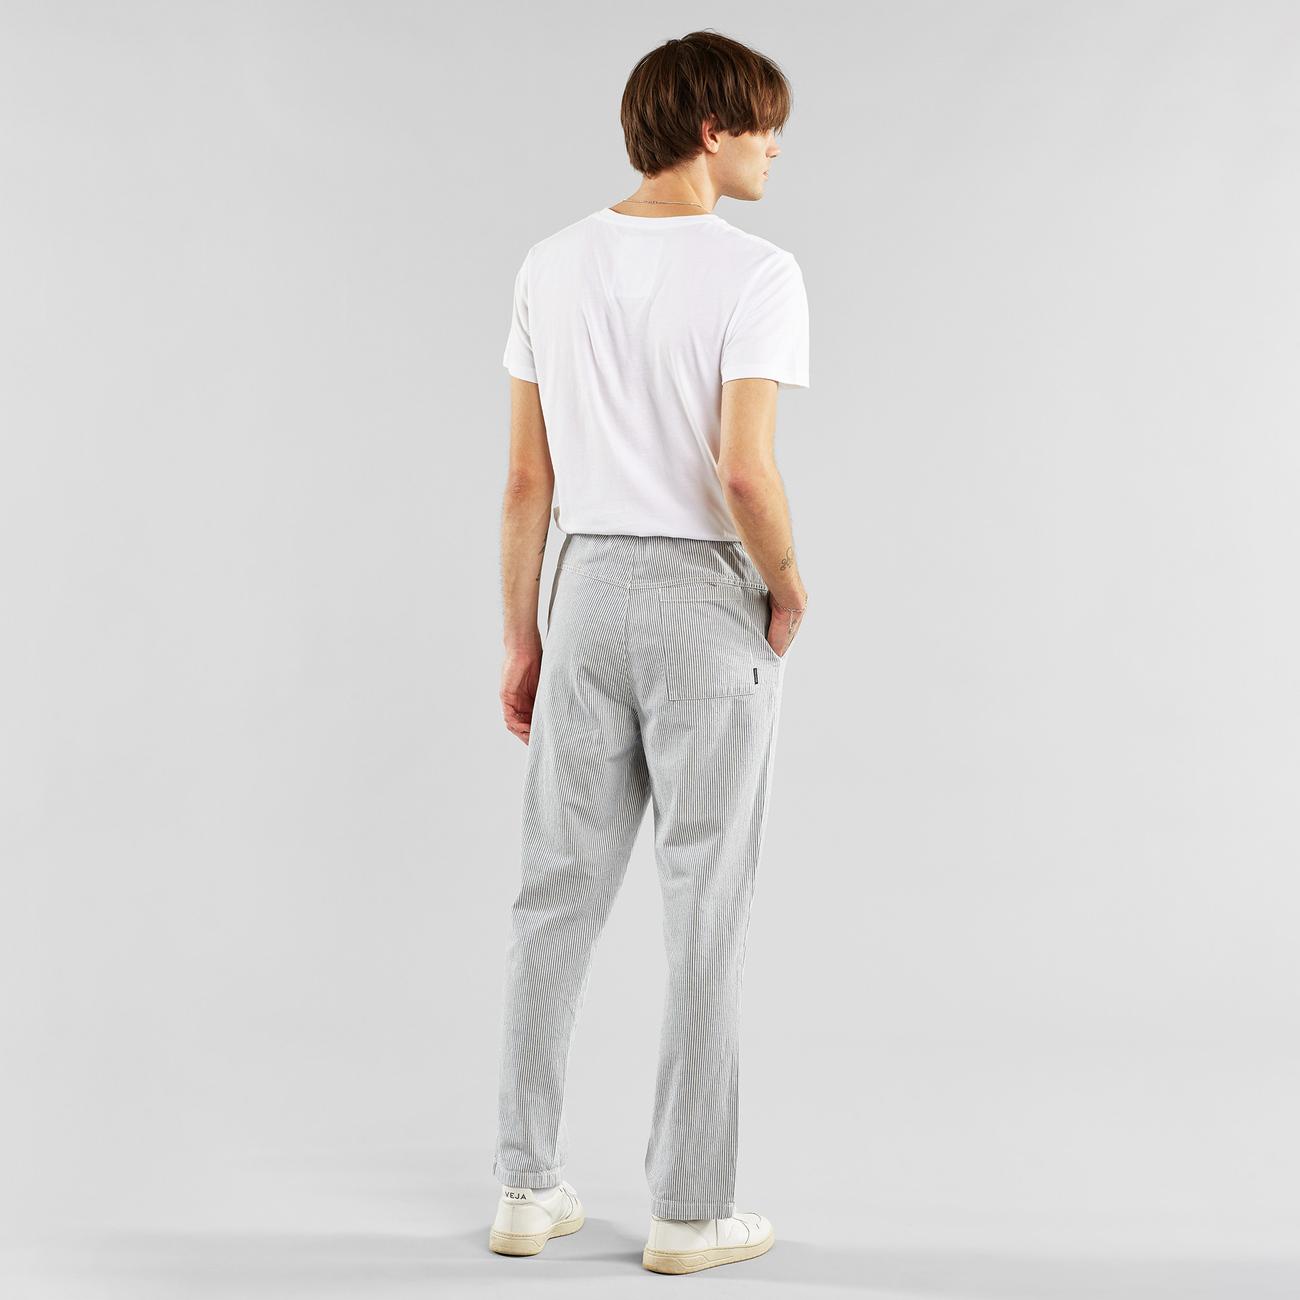 Pants Klitmoeller Thin Stripes